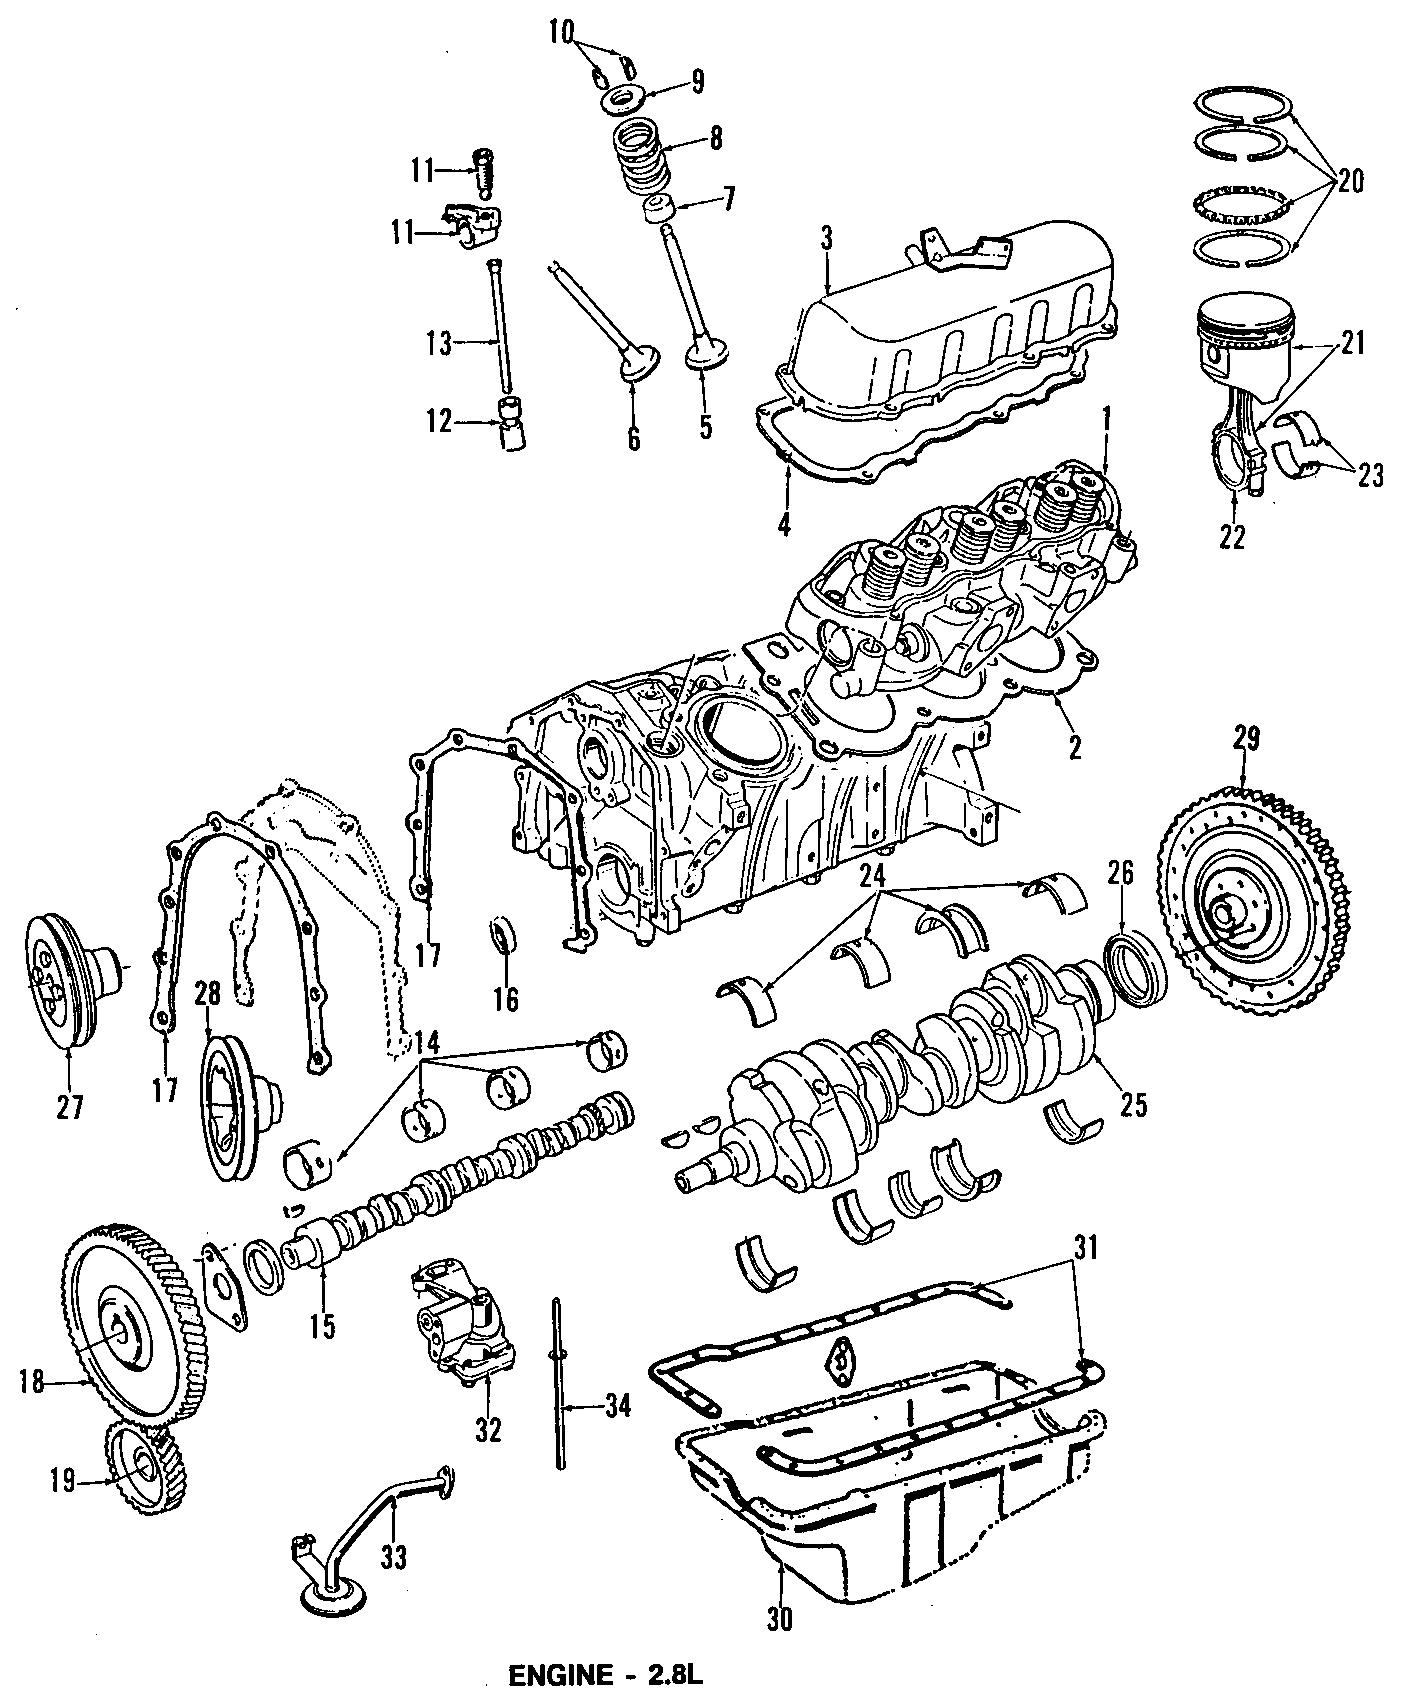 Ford Aerostar Camshaft Gear Timing Sprocket Engine 4